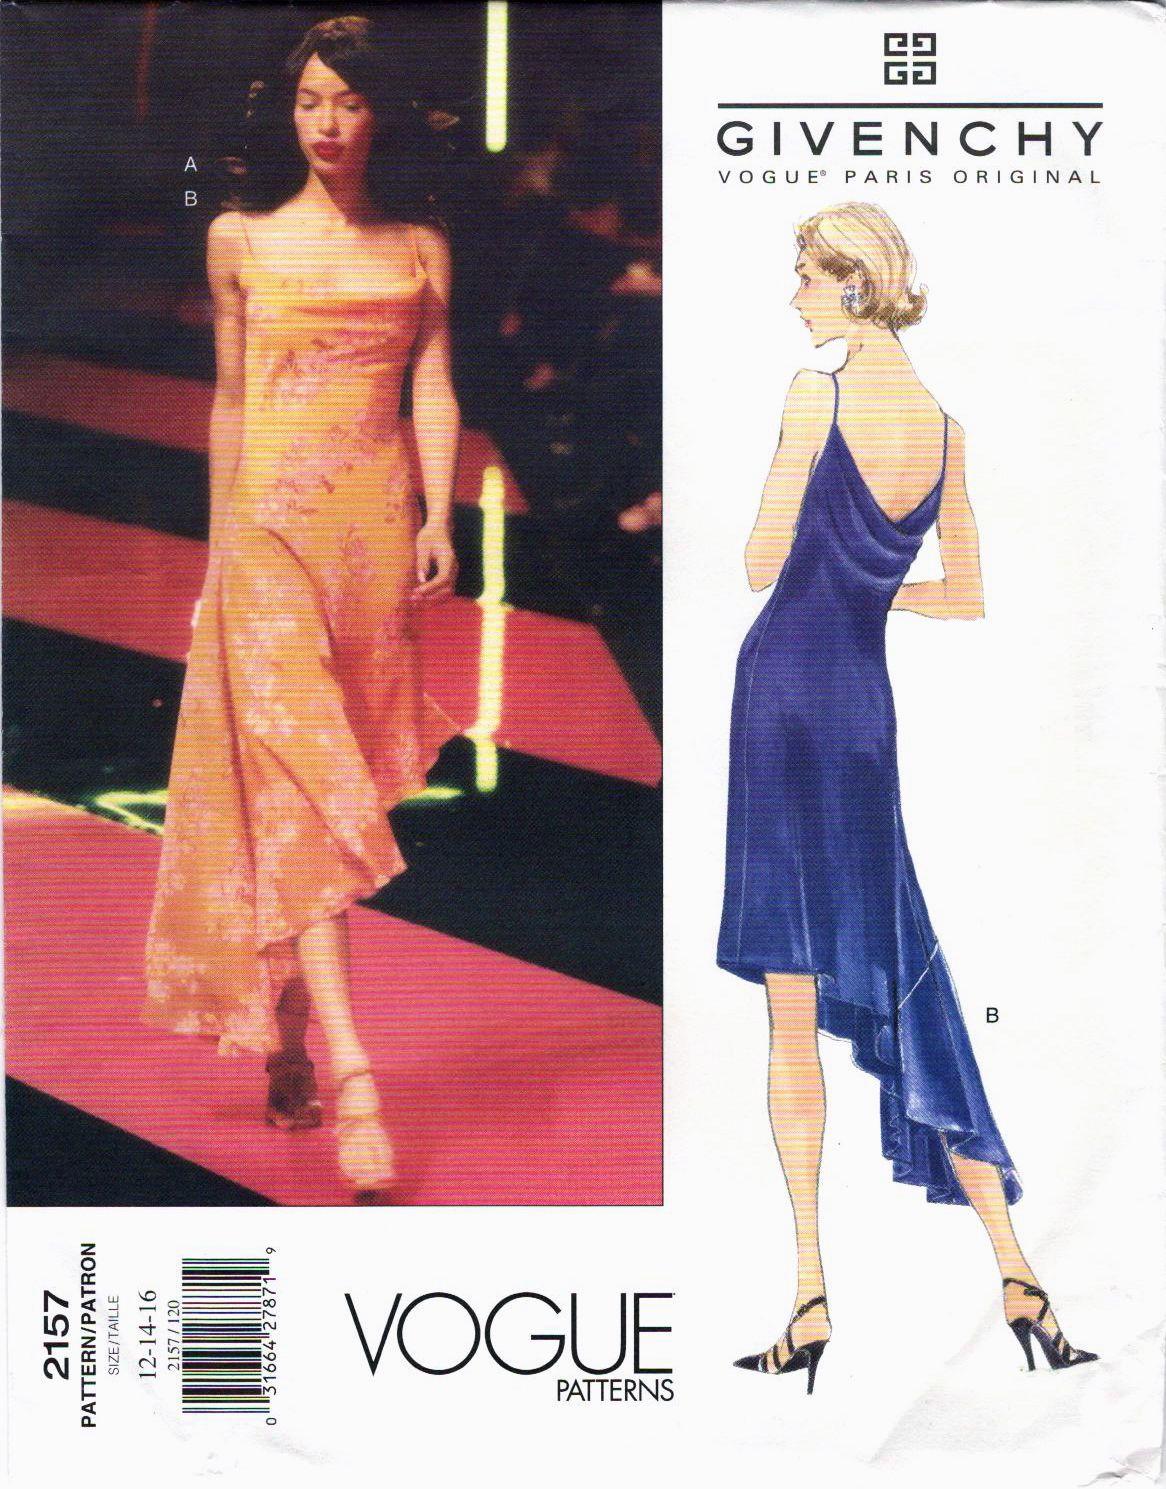 Alexander McQueen for Givenchy Vogue Patterns, Part 20   Vogue ...